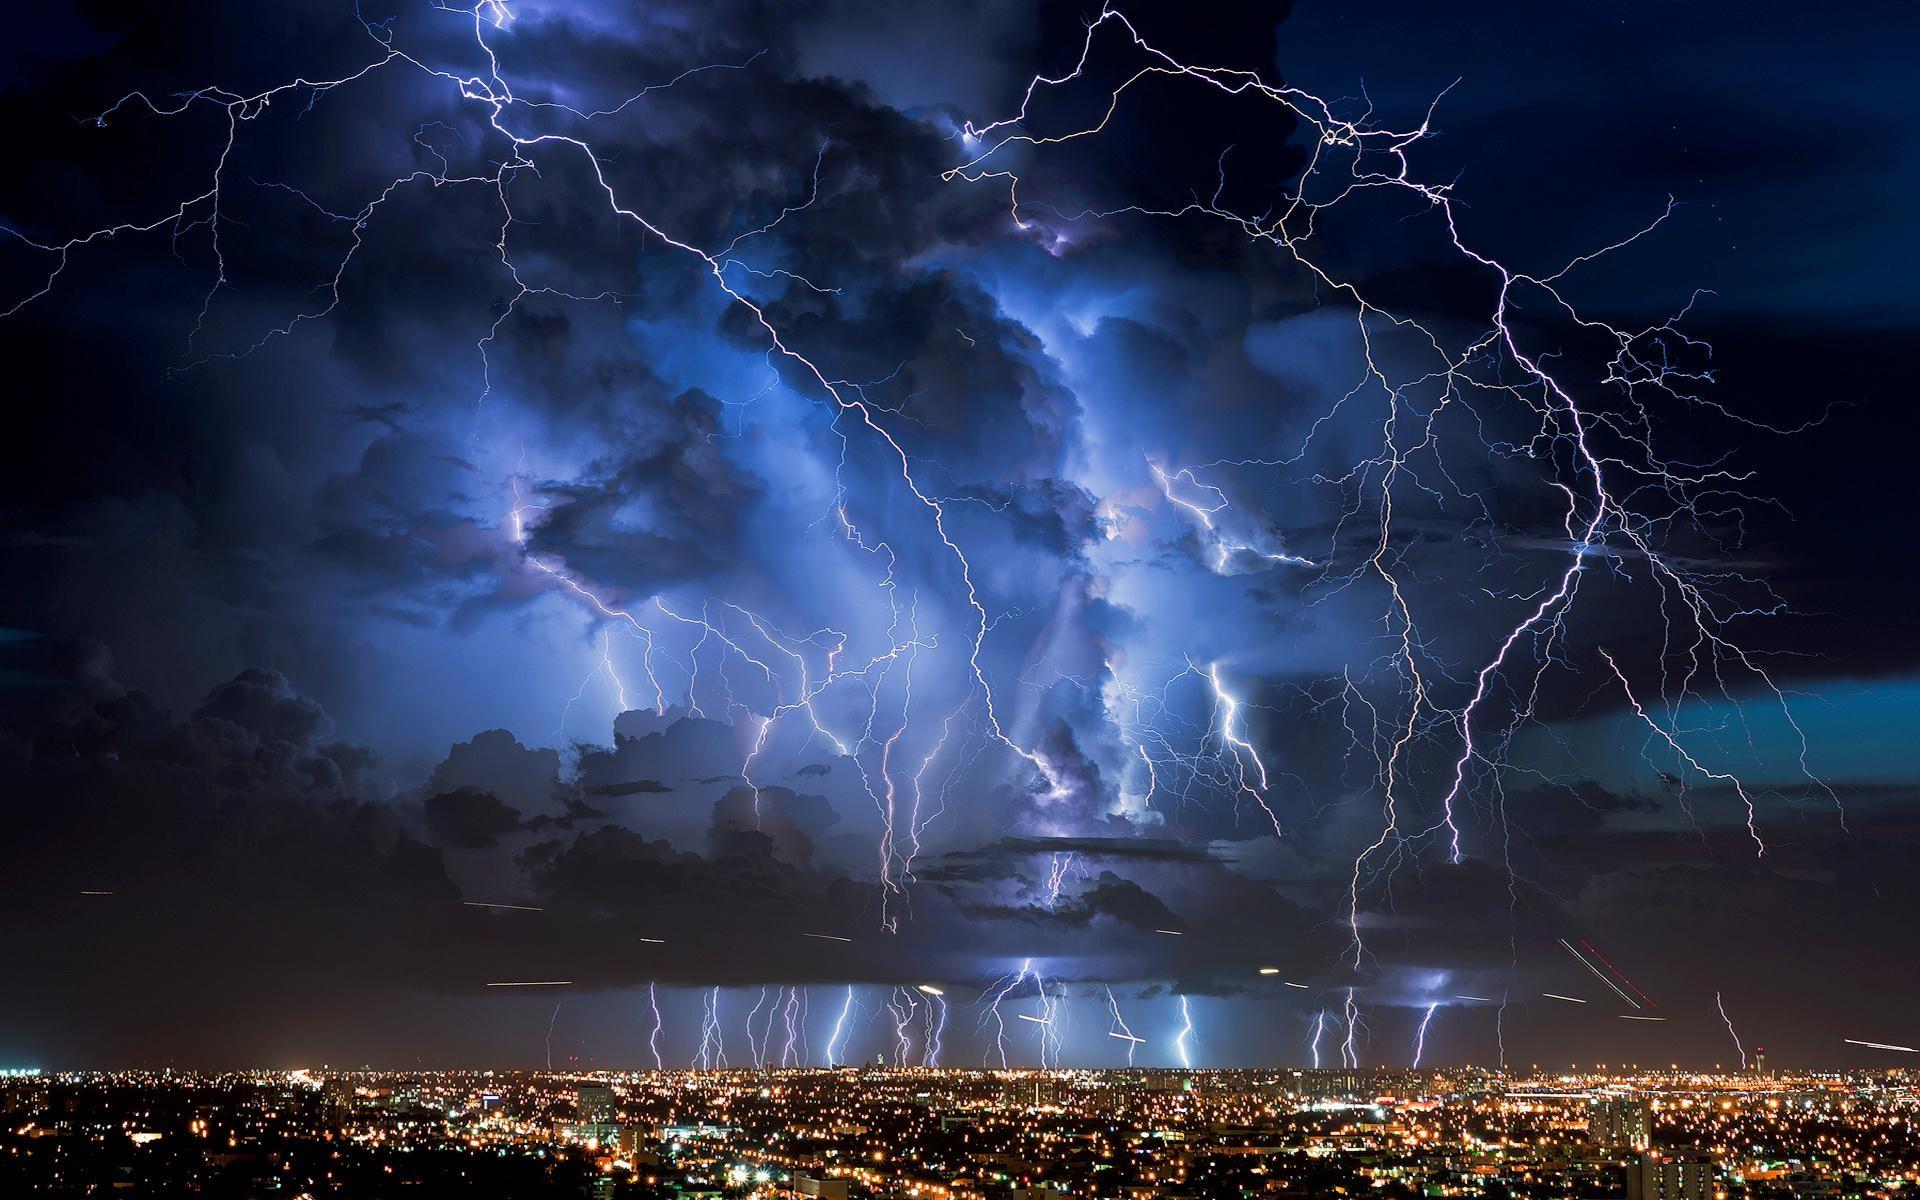 wallpaper.wiki-Lightning-Storm-Wallpapers-HD-PIC-WPD001936